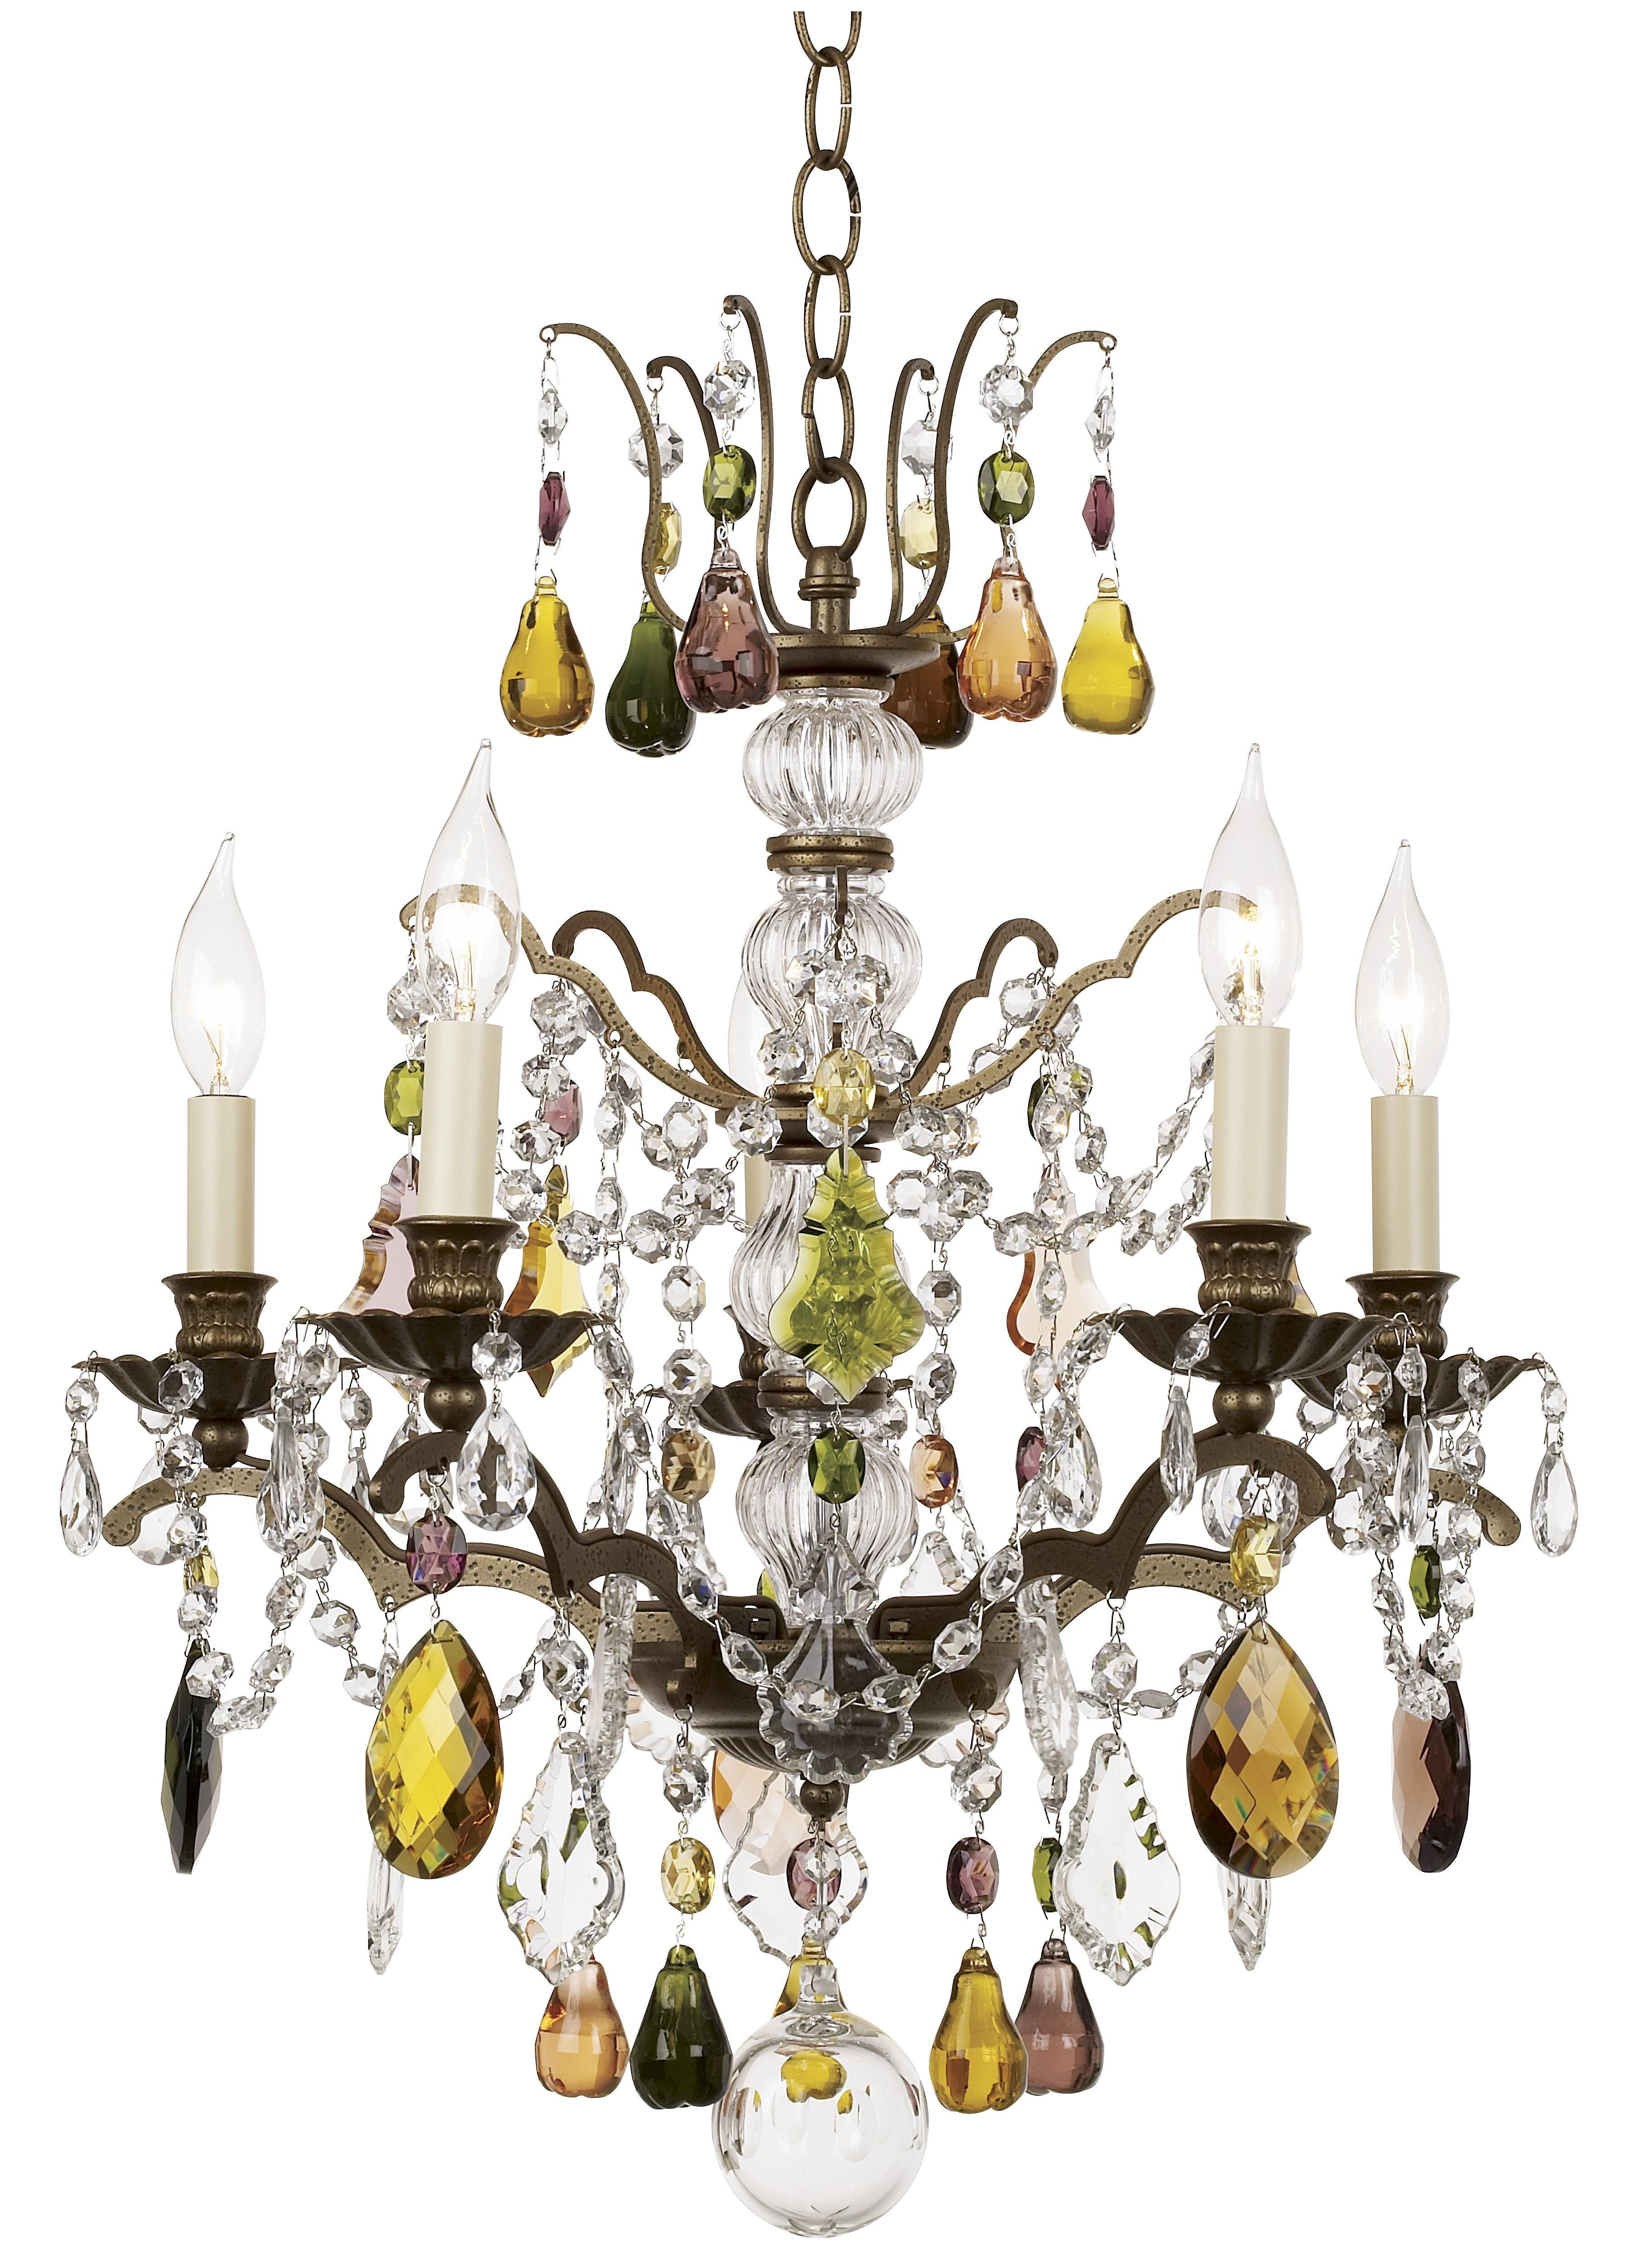 Schonbek gallia collection multi color crystal chandelier schonbek gallia collection multi color crystal chandelier aloadofball Images